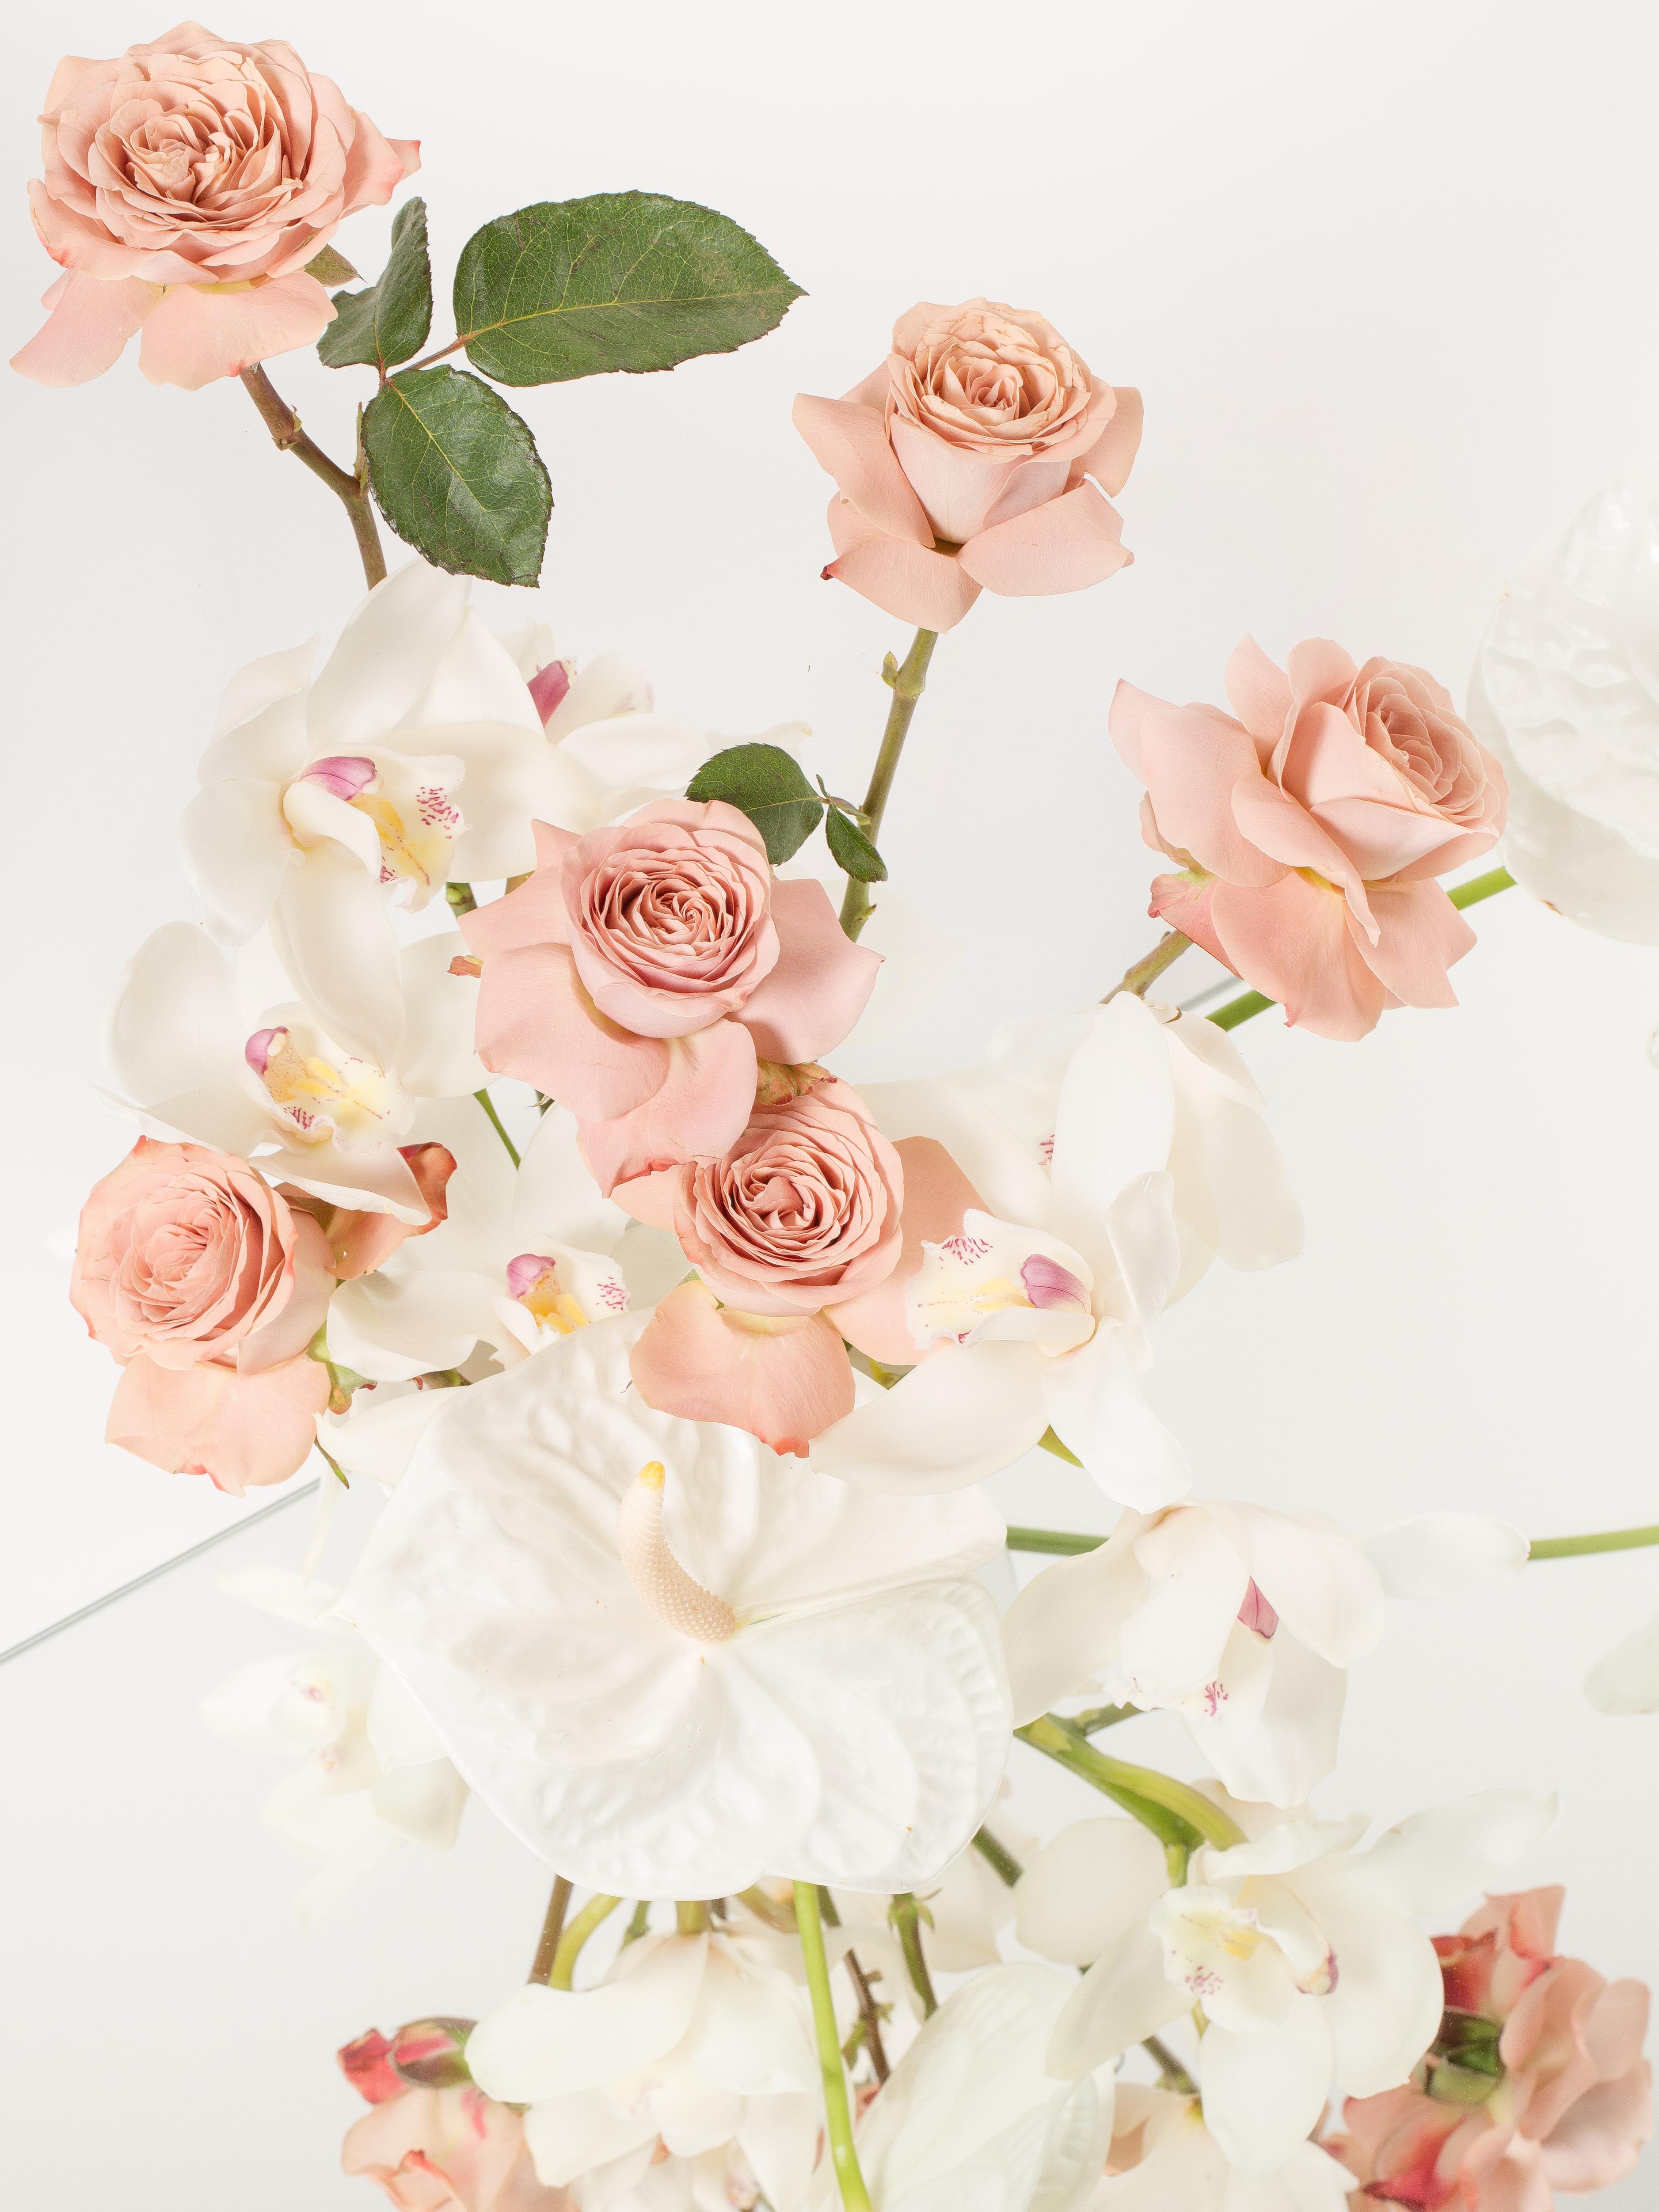 Milou_Floral_spiegel_9